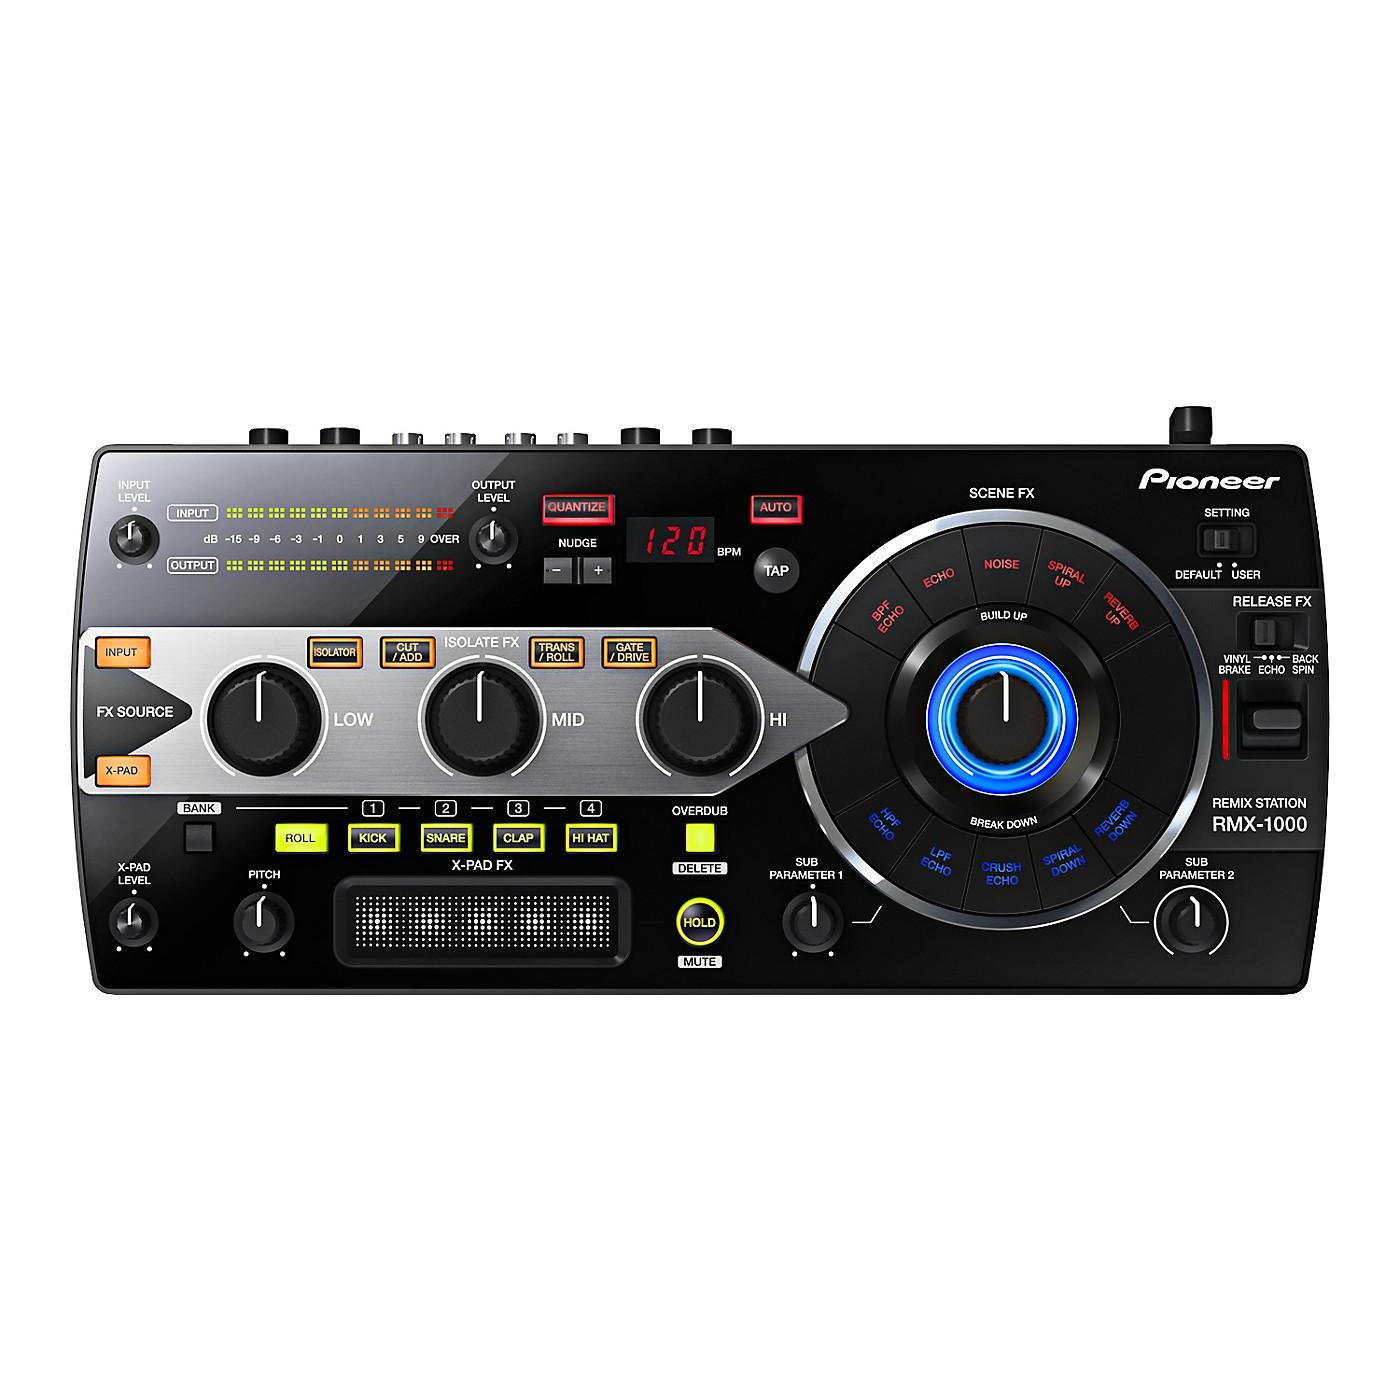 Pioneer DJ RMX-1000 Remix Station thumbnail